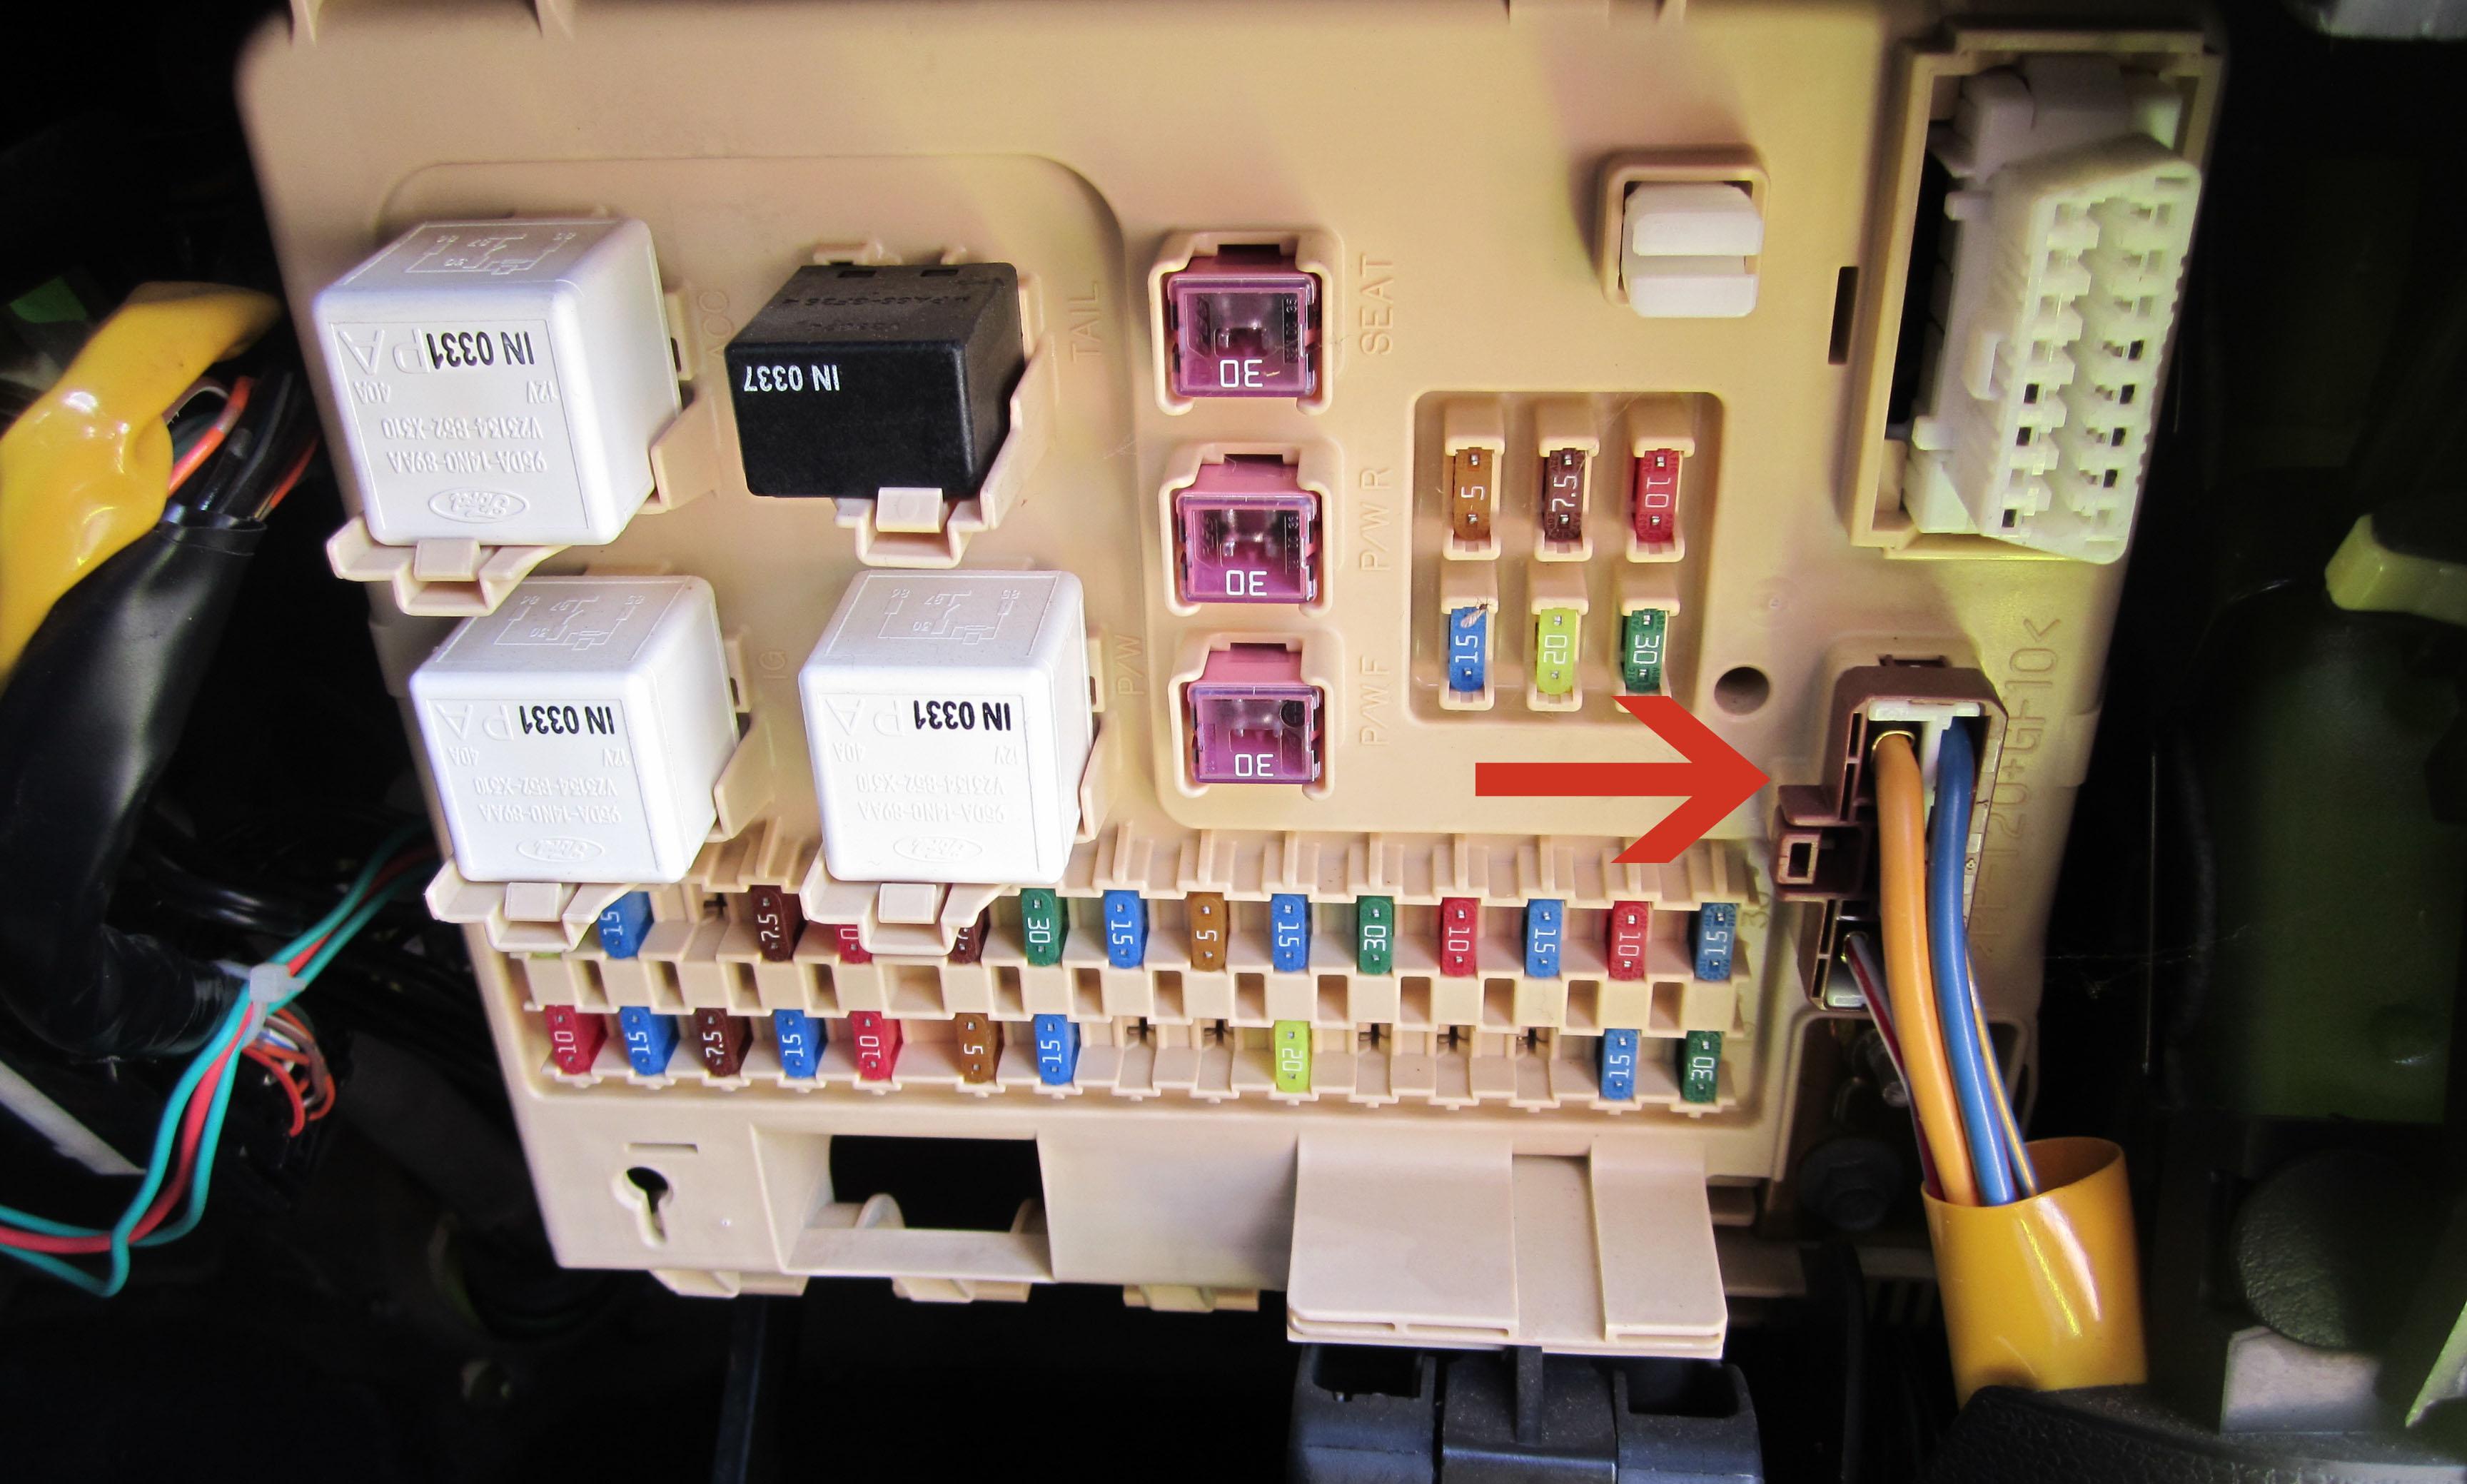 ford falcon xt fuse box wiring diagram fascinatingau ford fuse box diagram 18 [ 3456 x 2079 Pixel ]